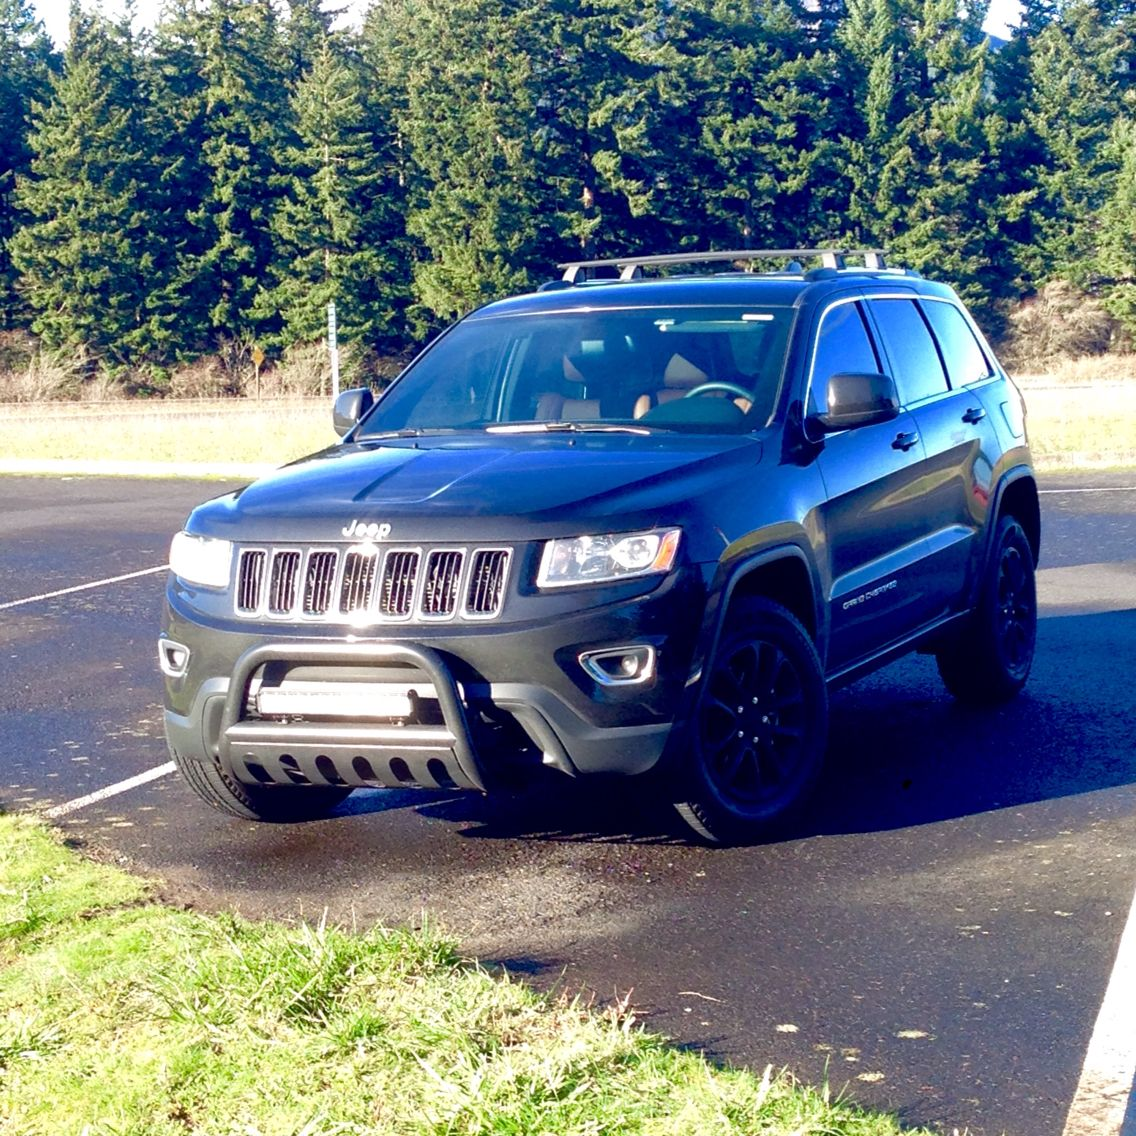 small resolution of 2014 jeep grand cherokee wk2 light bar bull bar brush guard plastidip black wheels